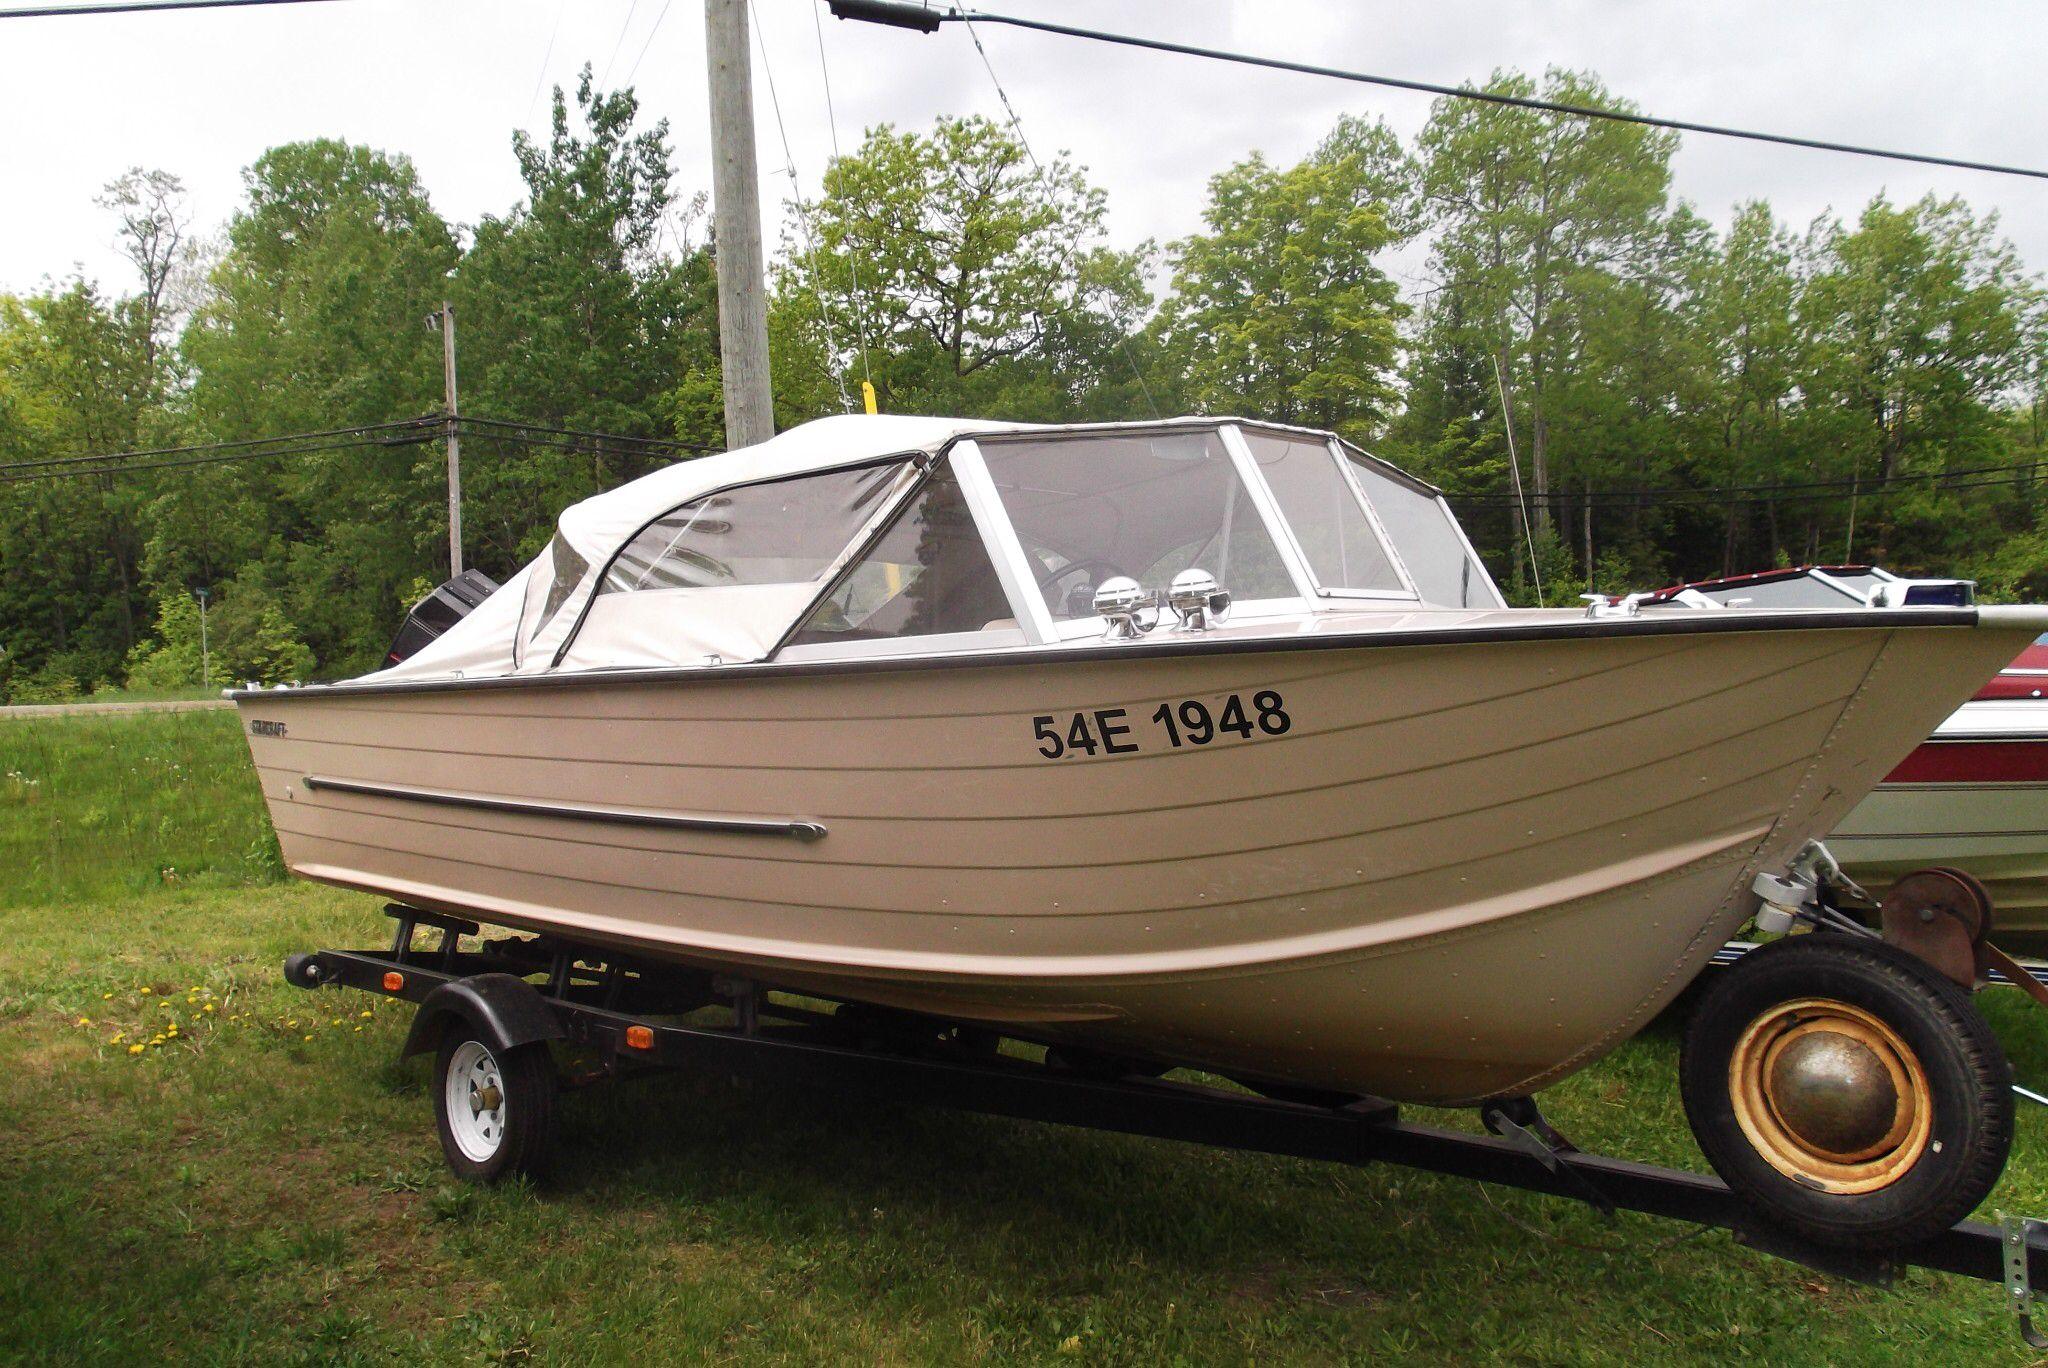 Starcraft Boat Boat Restoration, Aluminum Boat, Starcraft, Small Boats,  Aluminium Boats